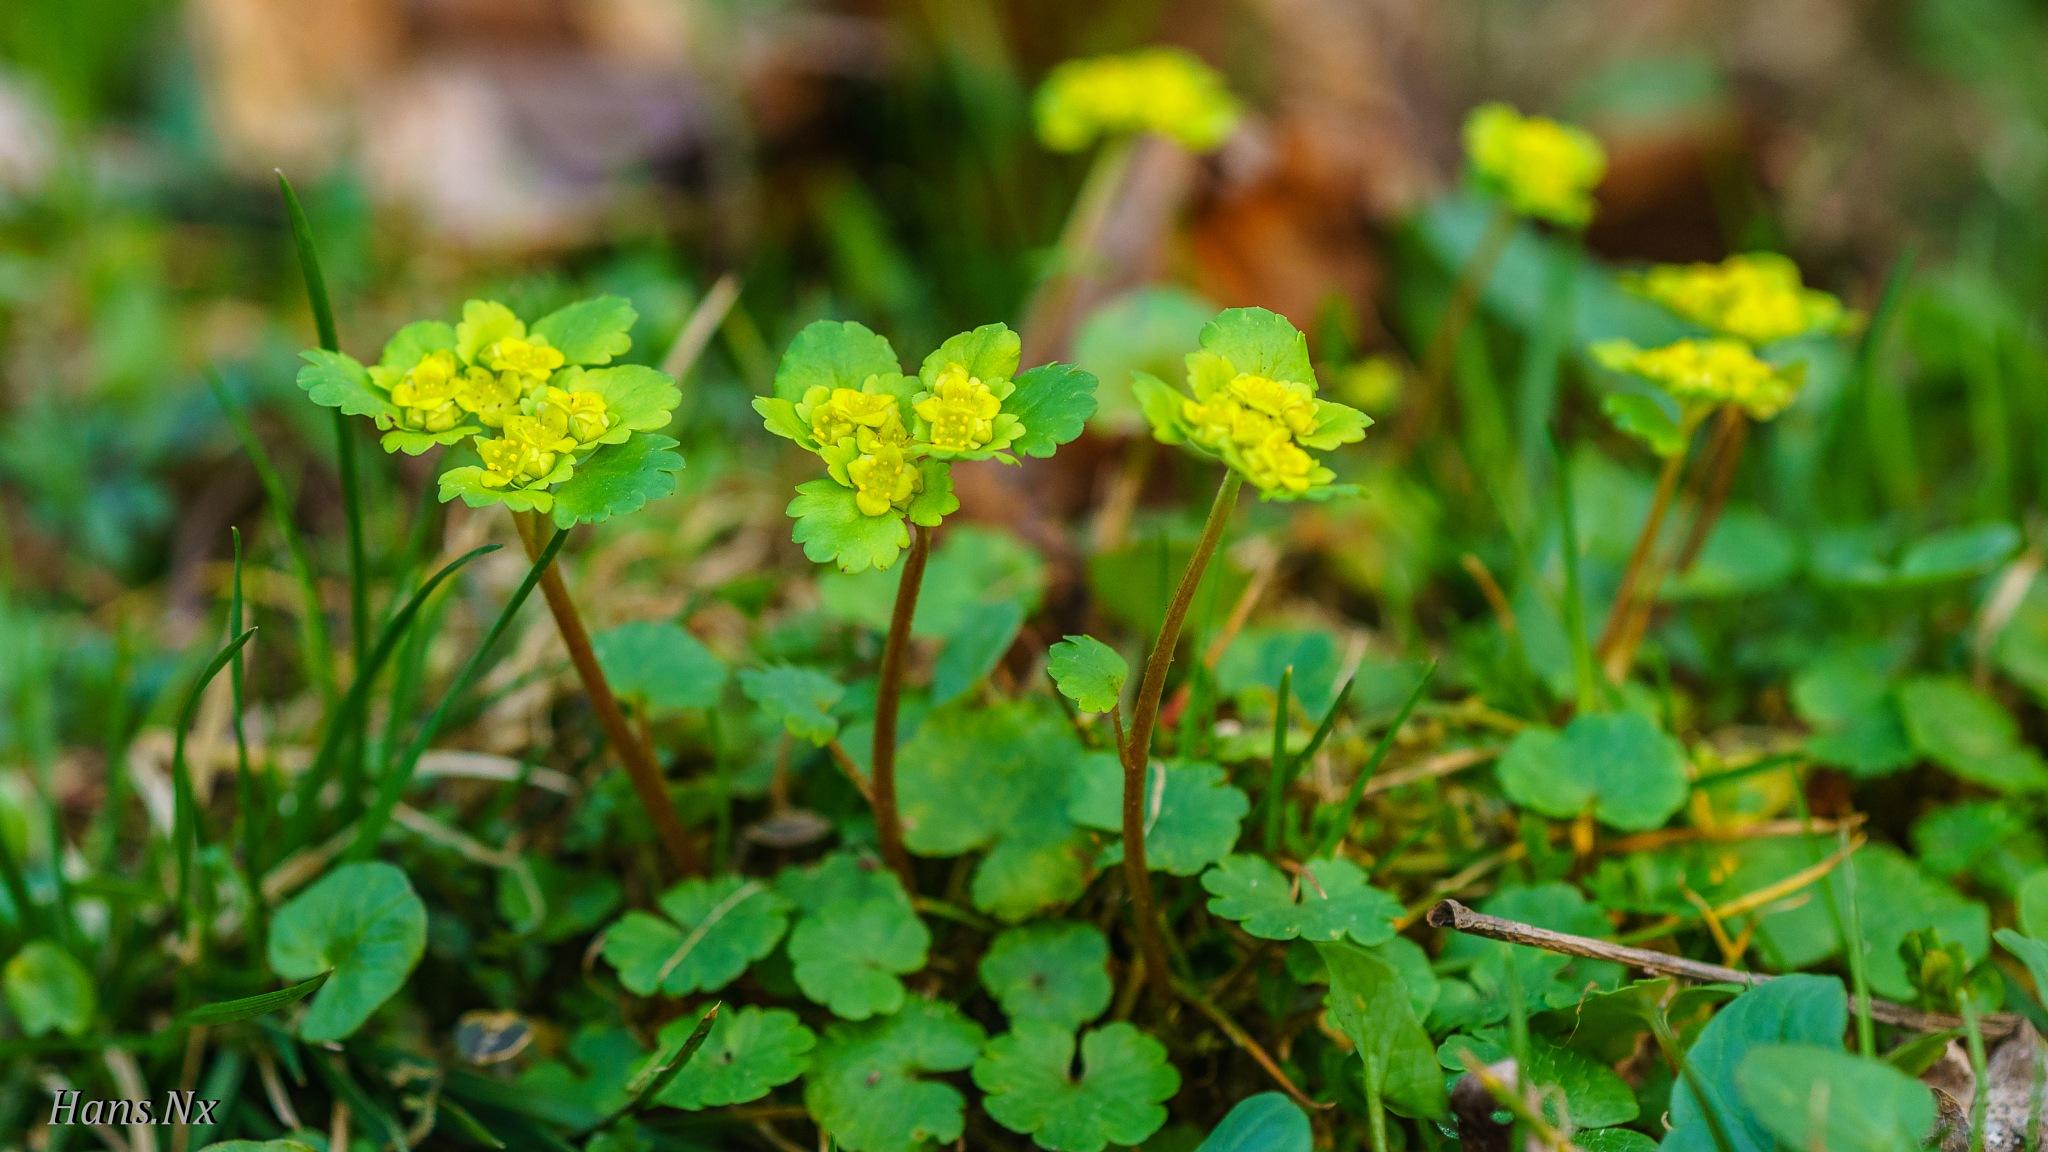 Chrysosplenium alternifolium - Gullpruda by Hans Nx